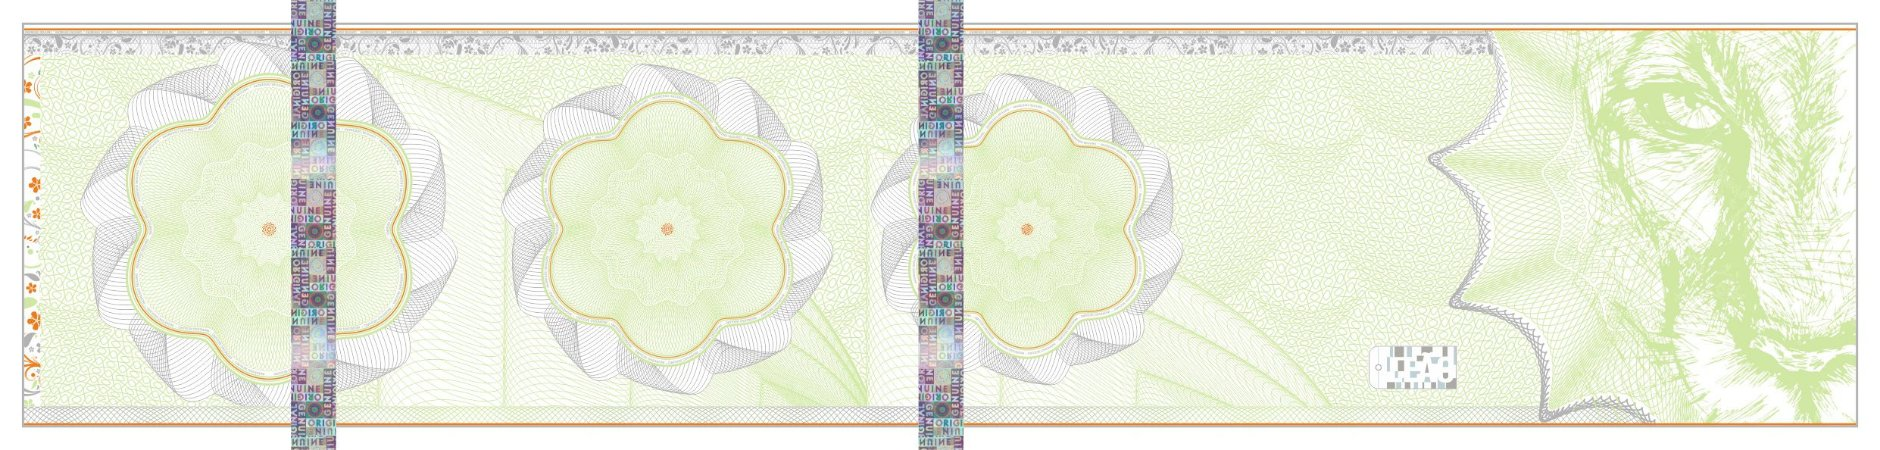 -Ingresso 3C Holografico Verde